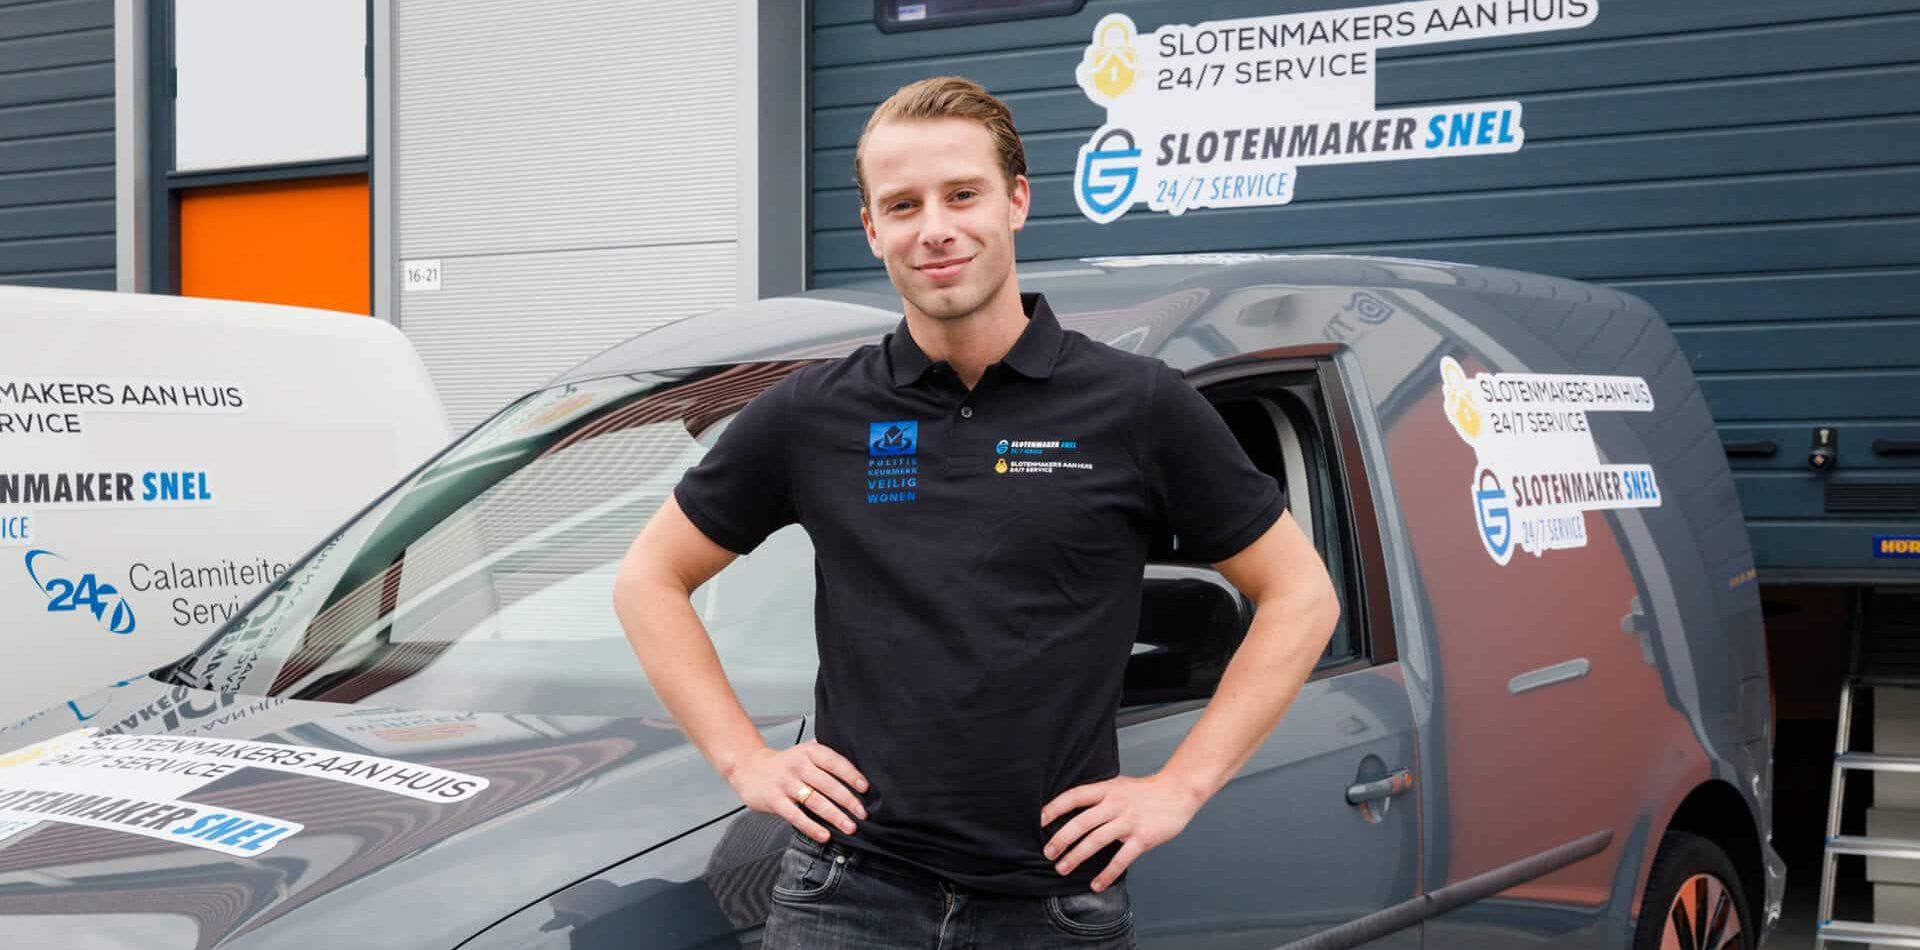 Slotenmaker Ypenburg